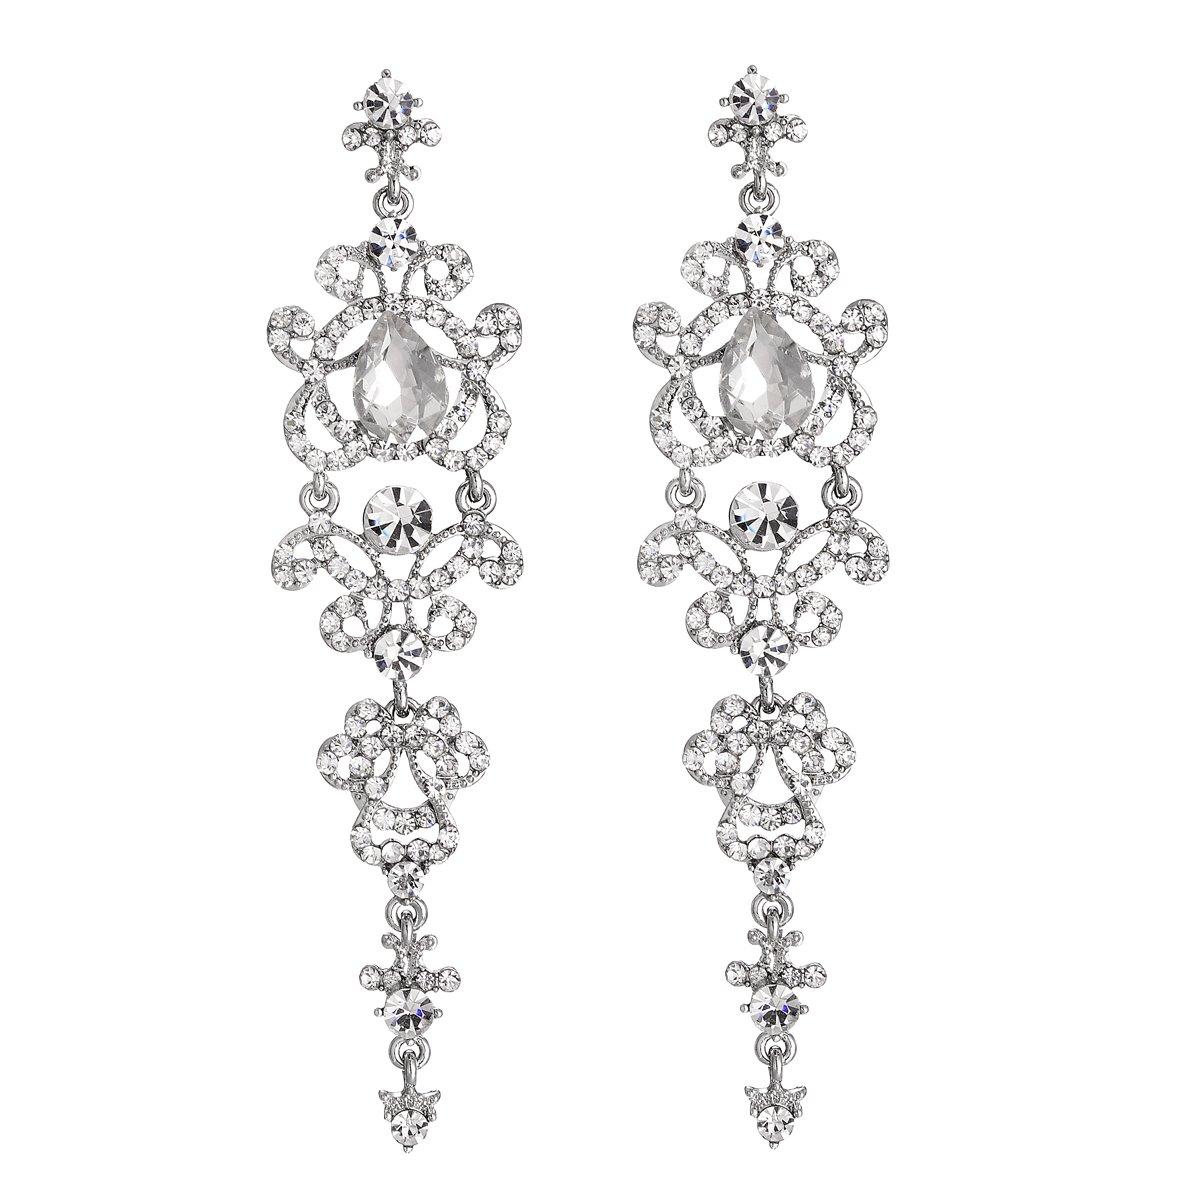 Jewelry & Watches Smart Women Bracelet Zircon Crystal Bracelet Bangle Womens Wedding Bridal Jewellery Gw